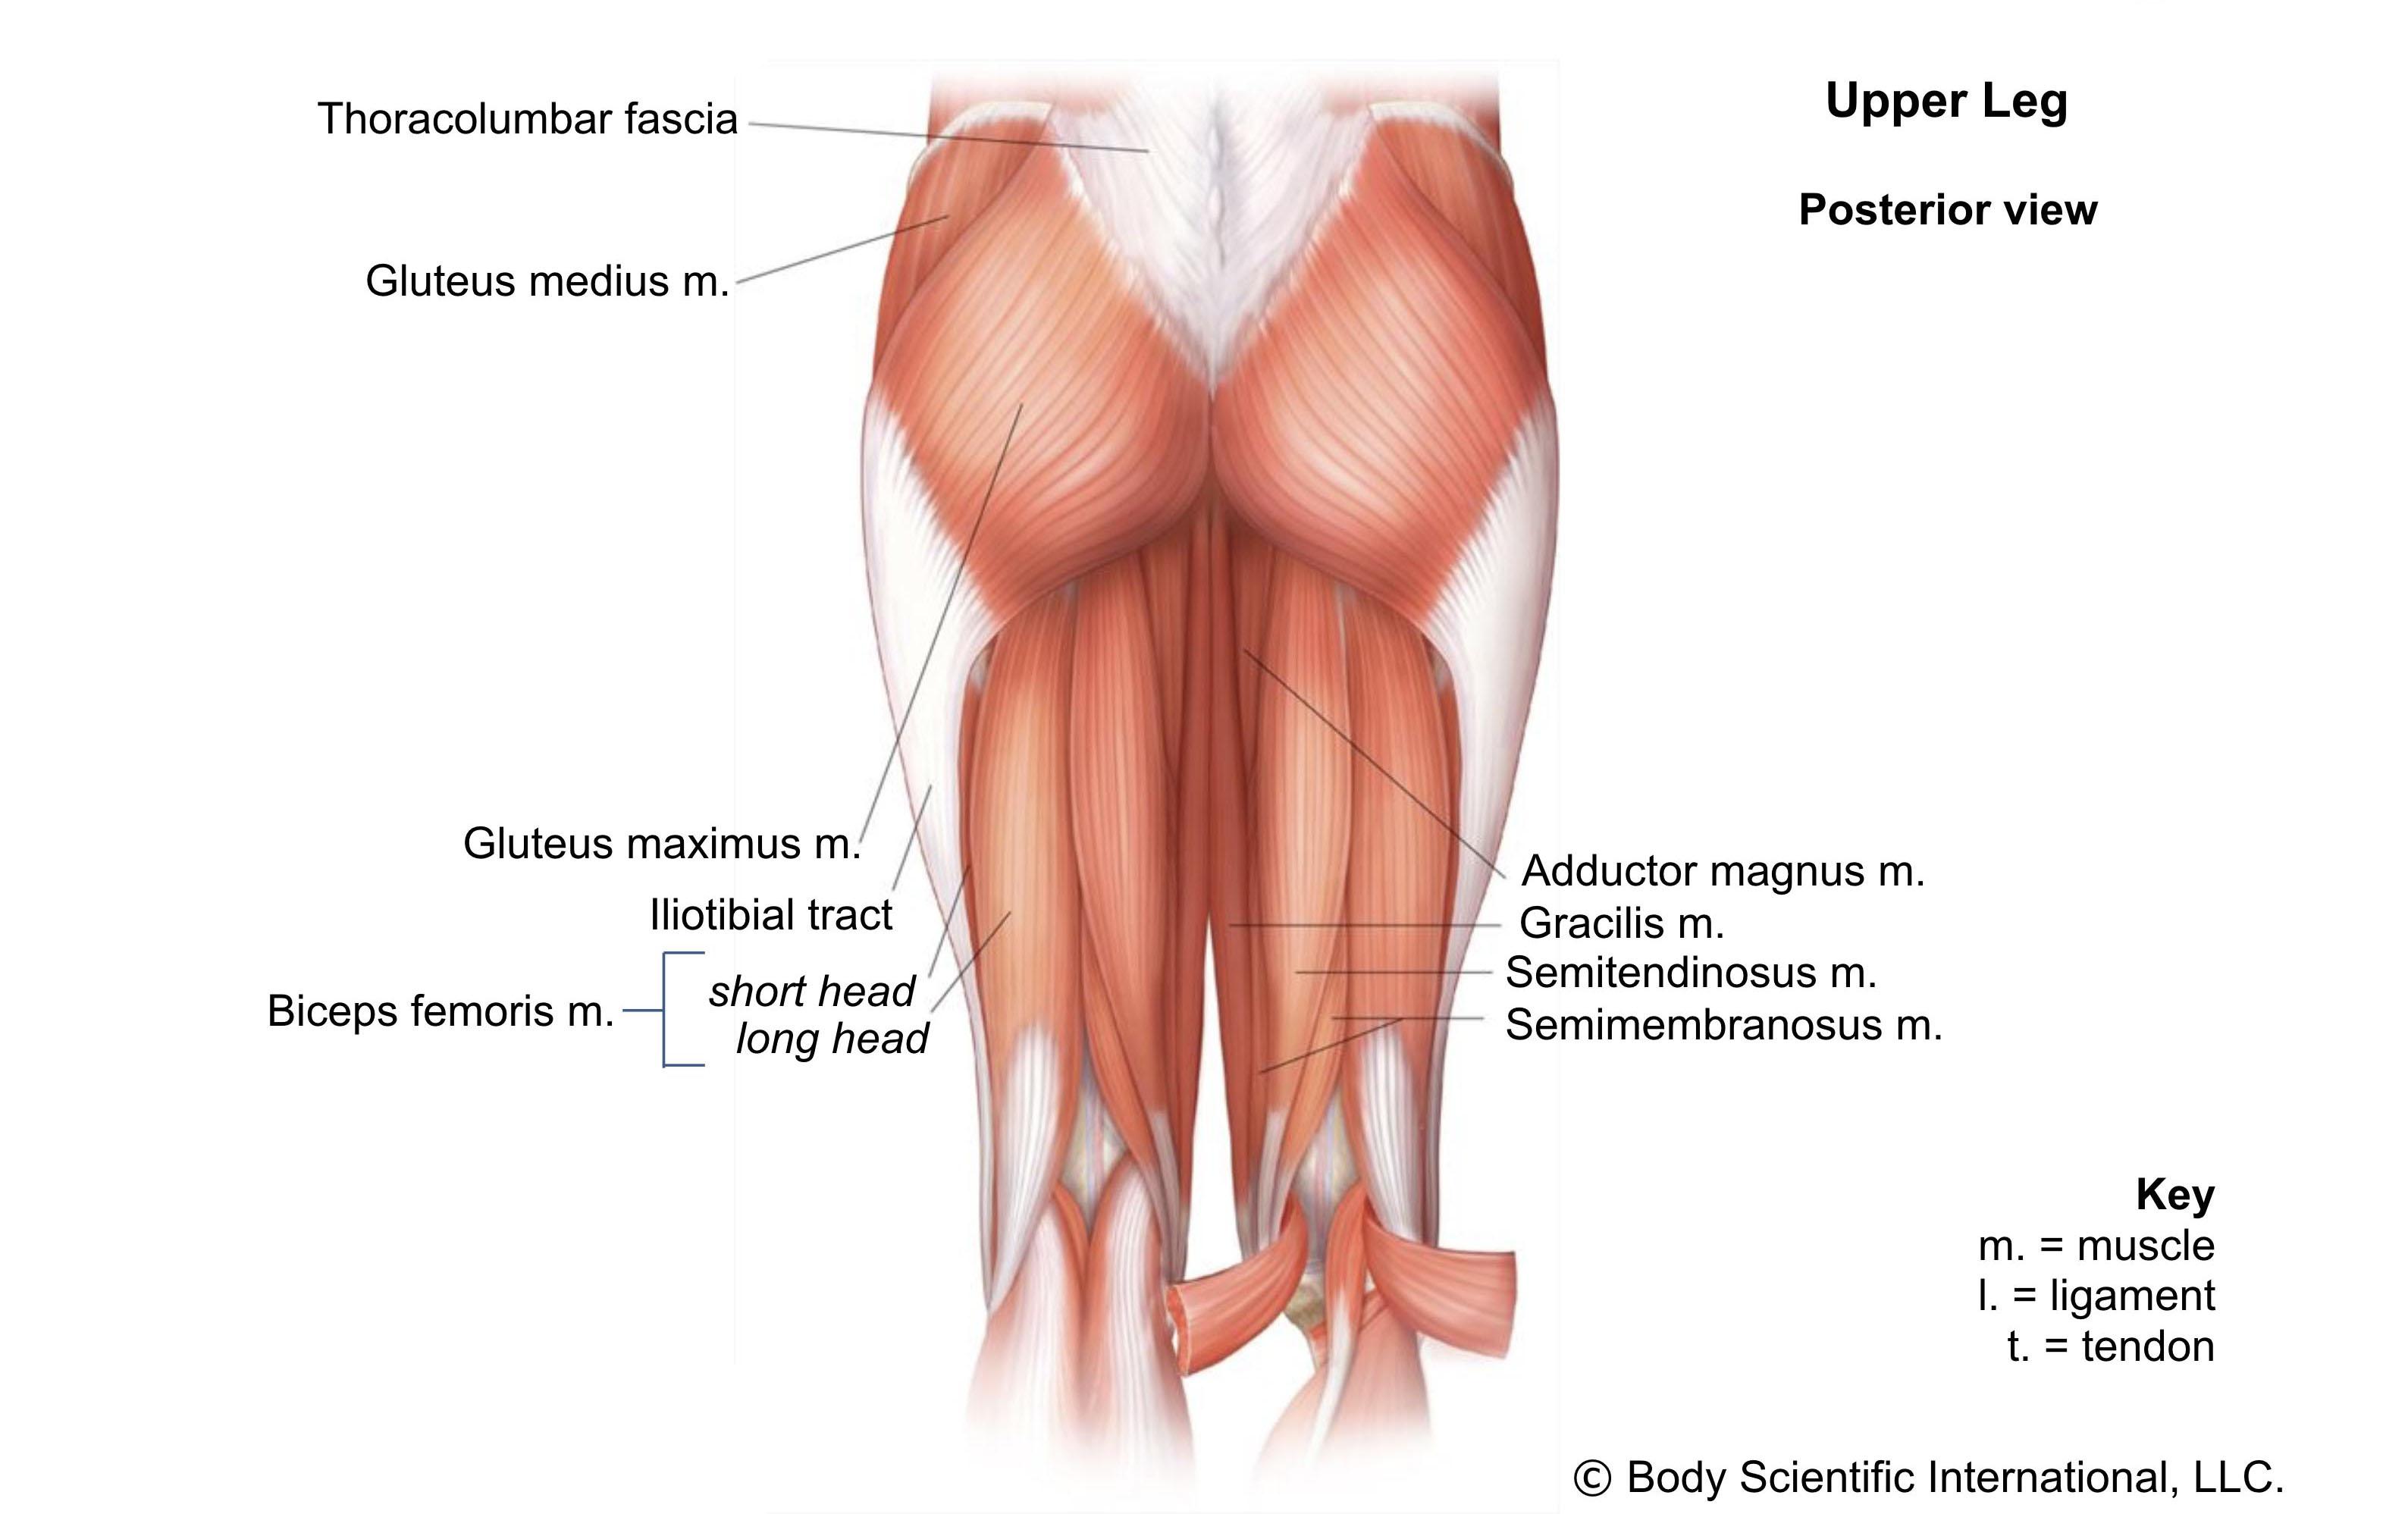 Upper Leg Posterior